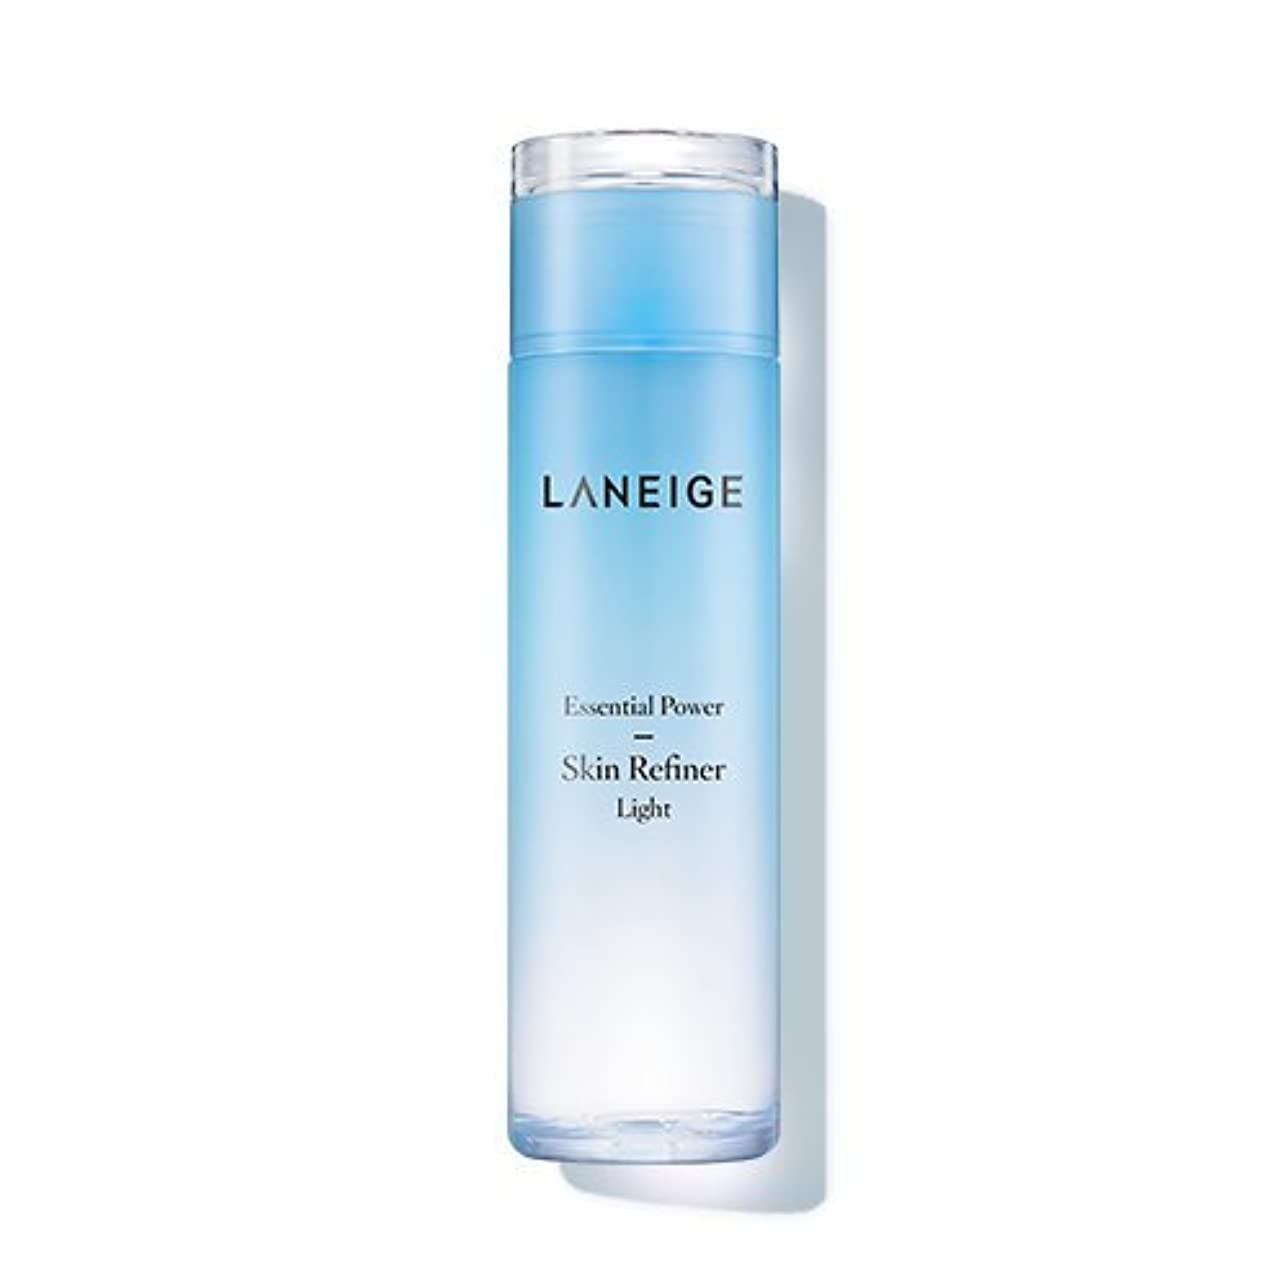 LANEIGE Essential Power Skin Refiner Light 200ml/ラネージュ エッセンシャル パワー スキン リファイナー ライト 200ml [並行輸入品]